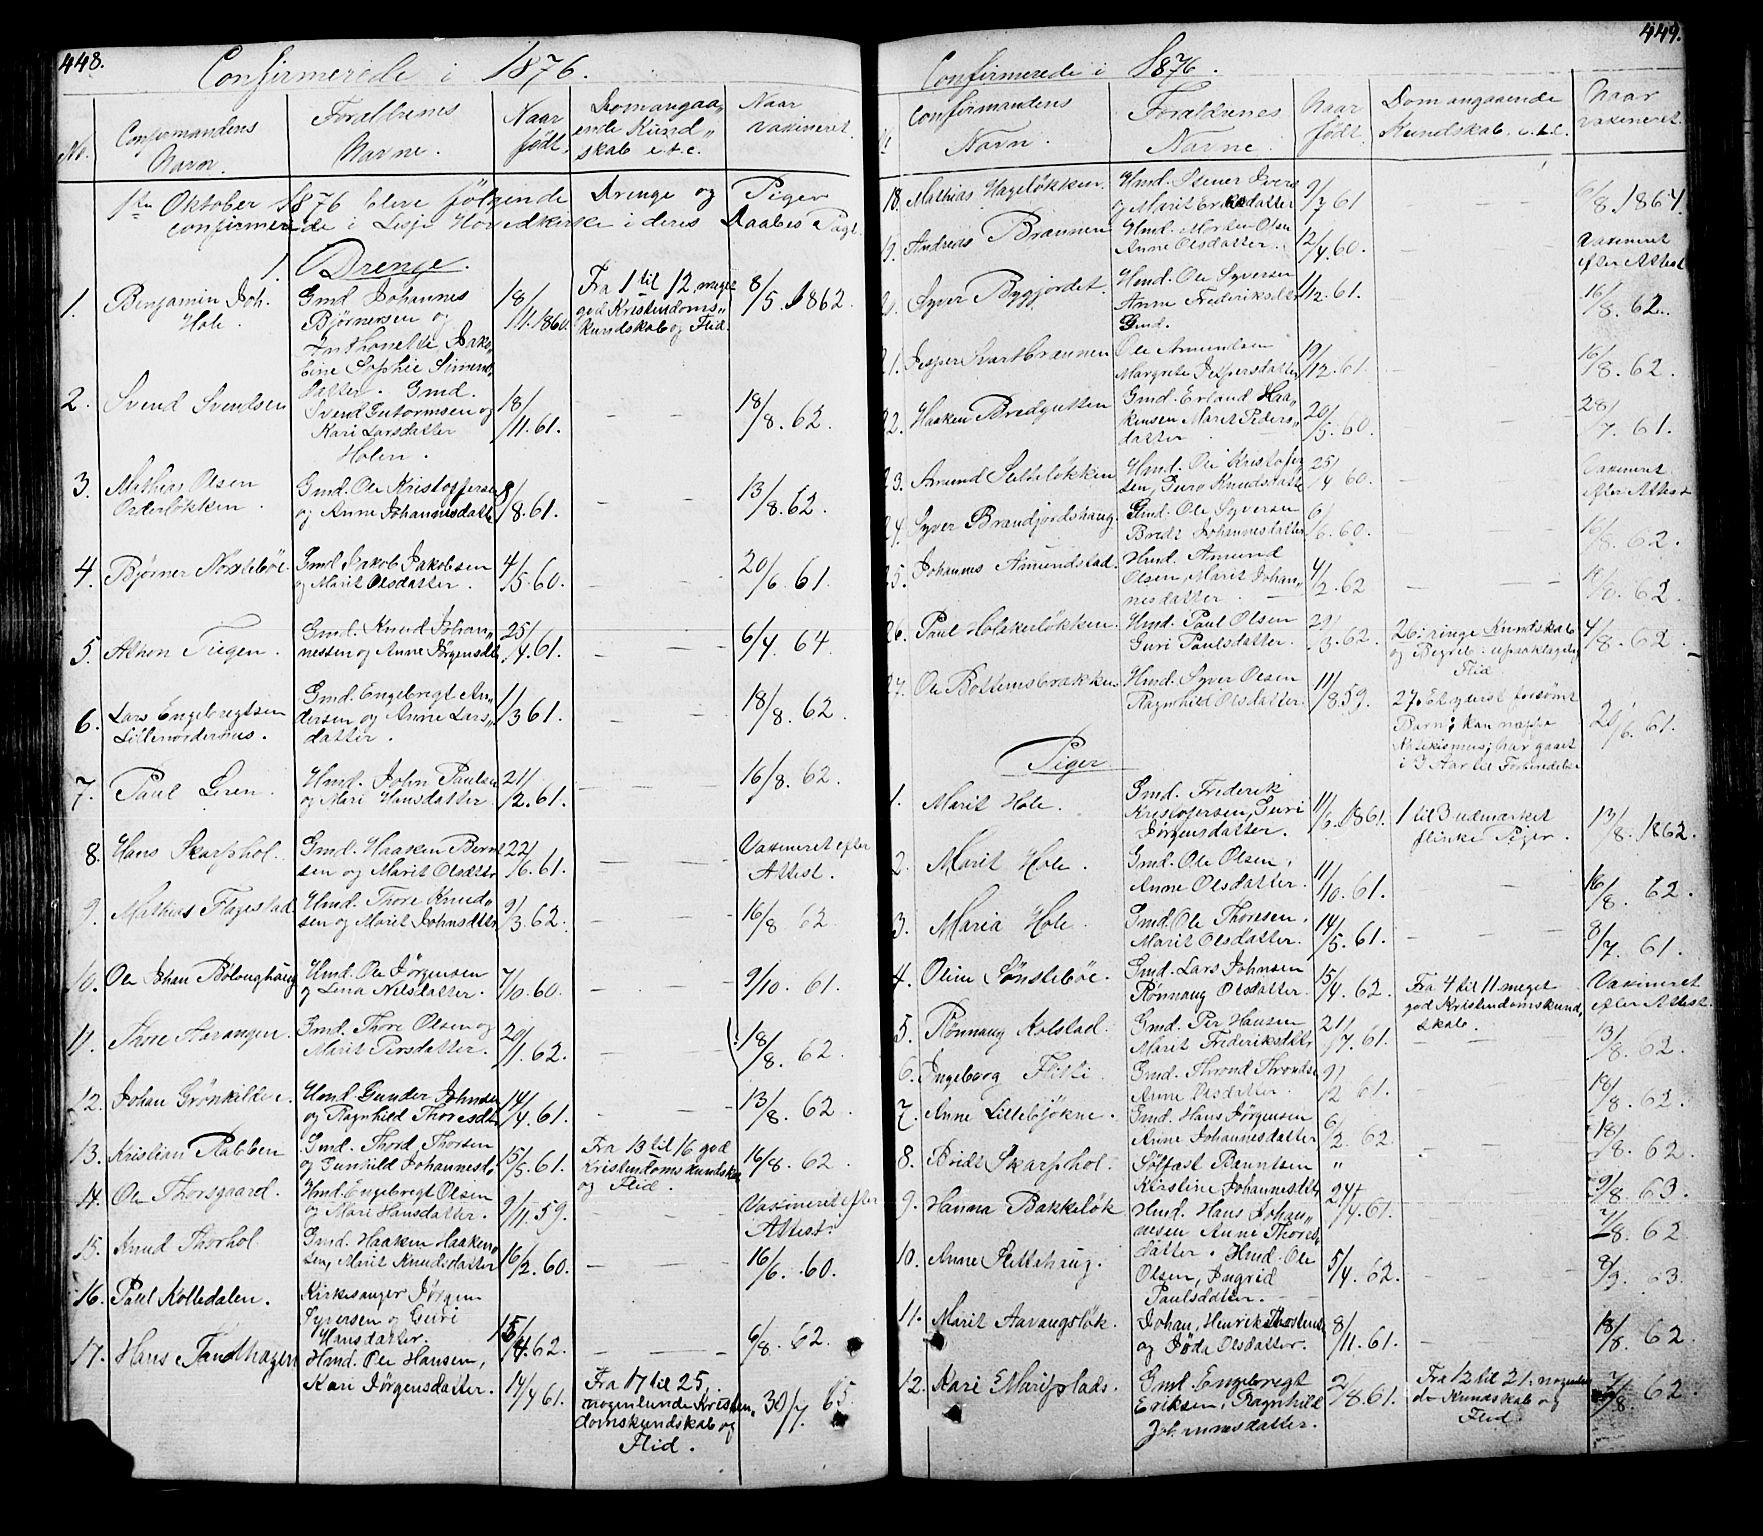 SAH, Lesja prestekontor, Klokkerbok nr. 5, 1850-1894, s. 448-449